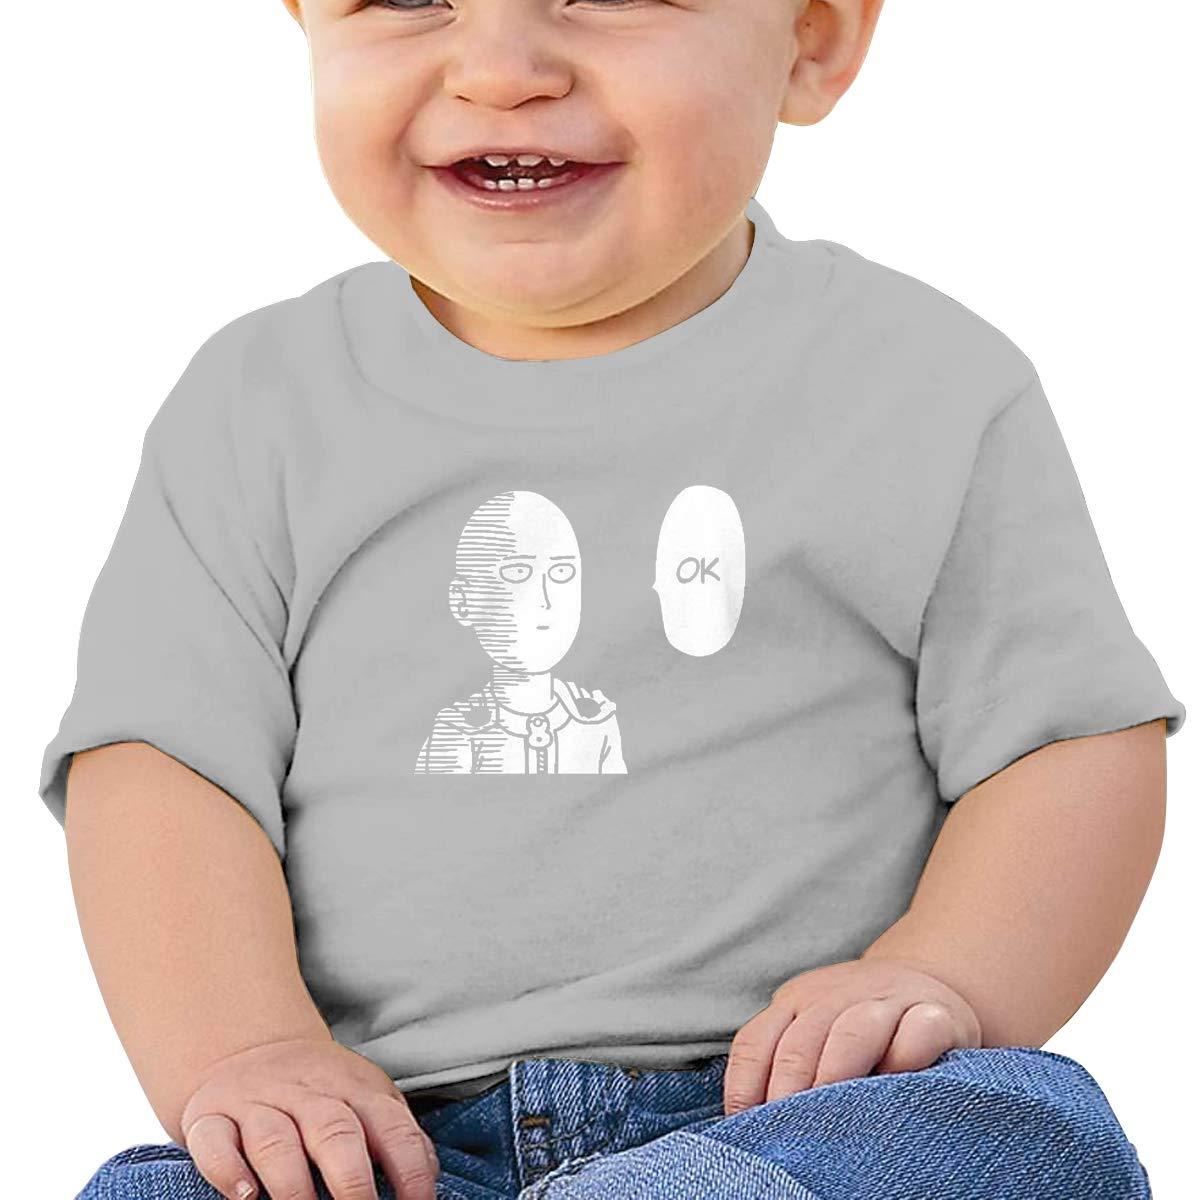 Saitama Ok Nordic Winter Personality Wild Gray 6-24 Month Baby T-Shirt One Punch Man